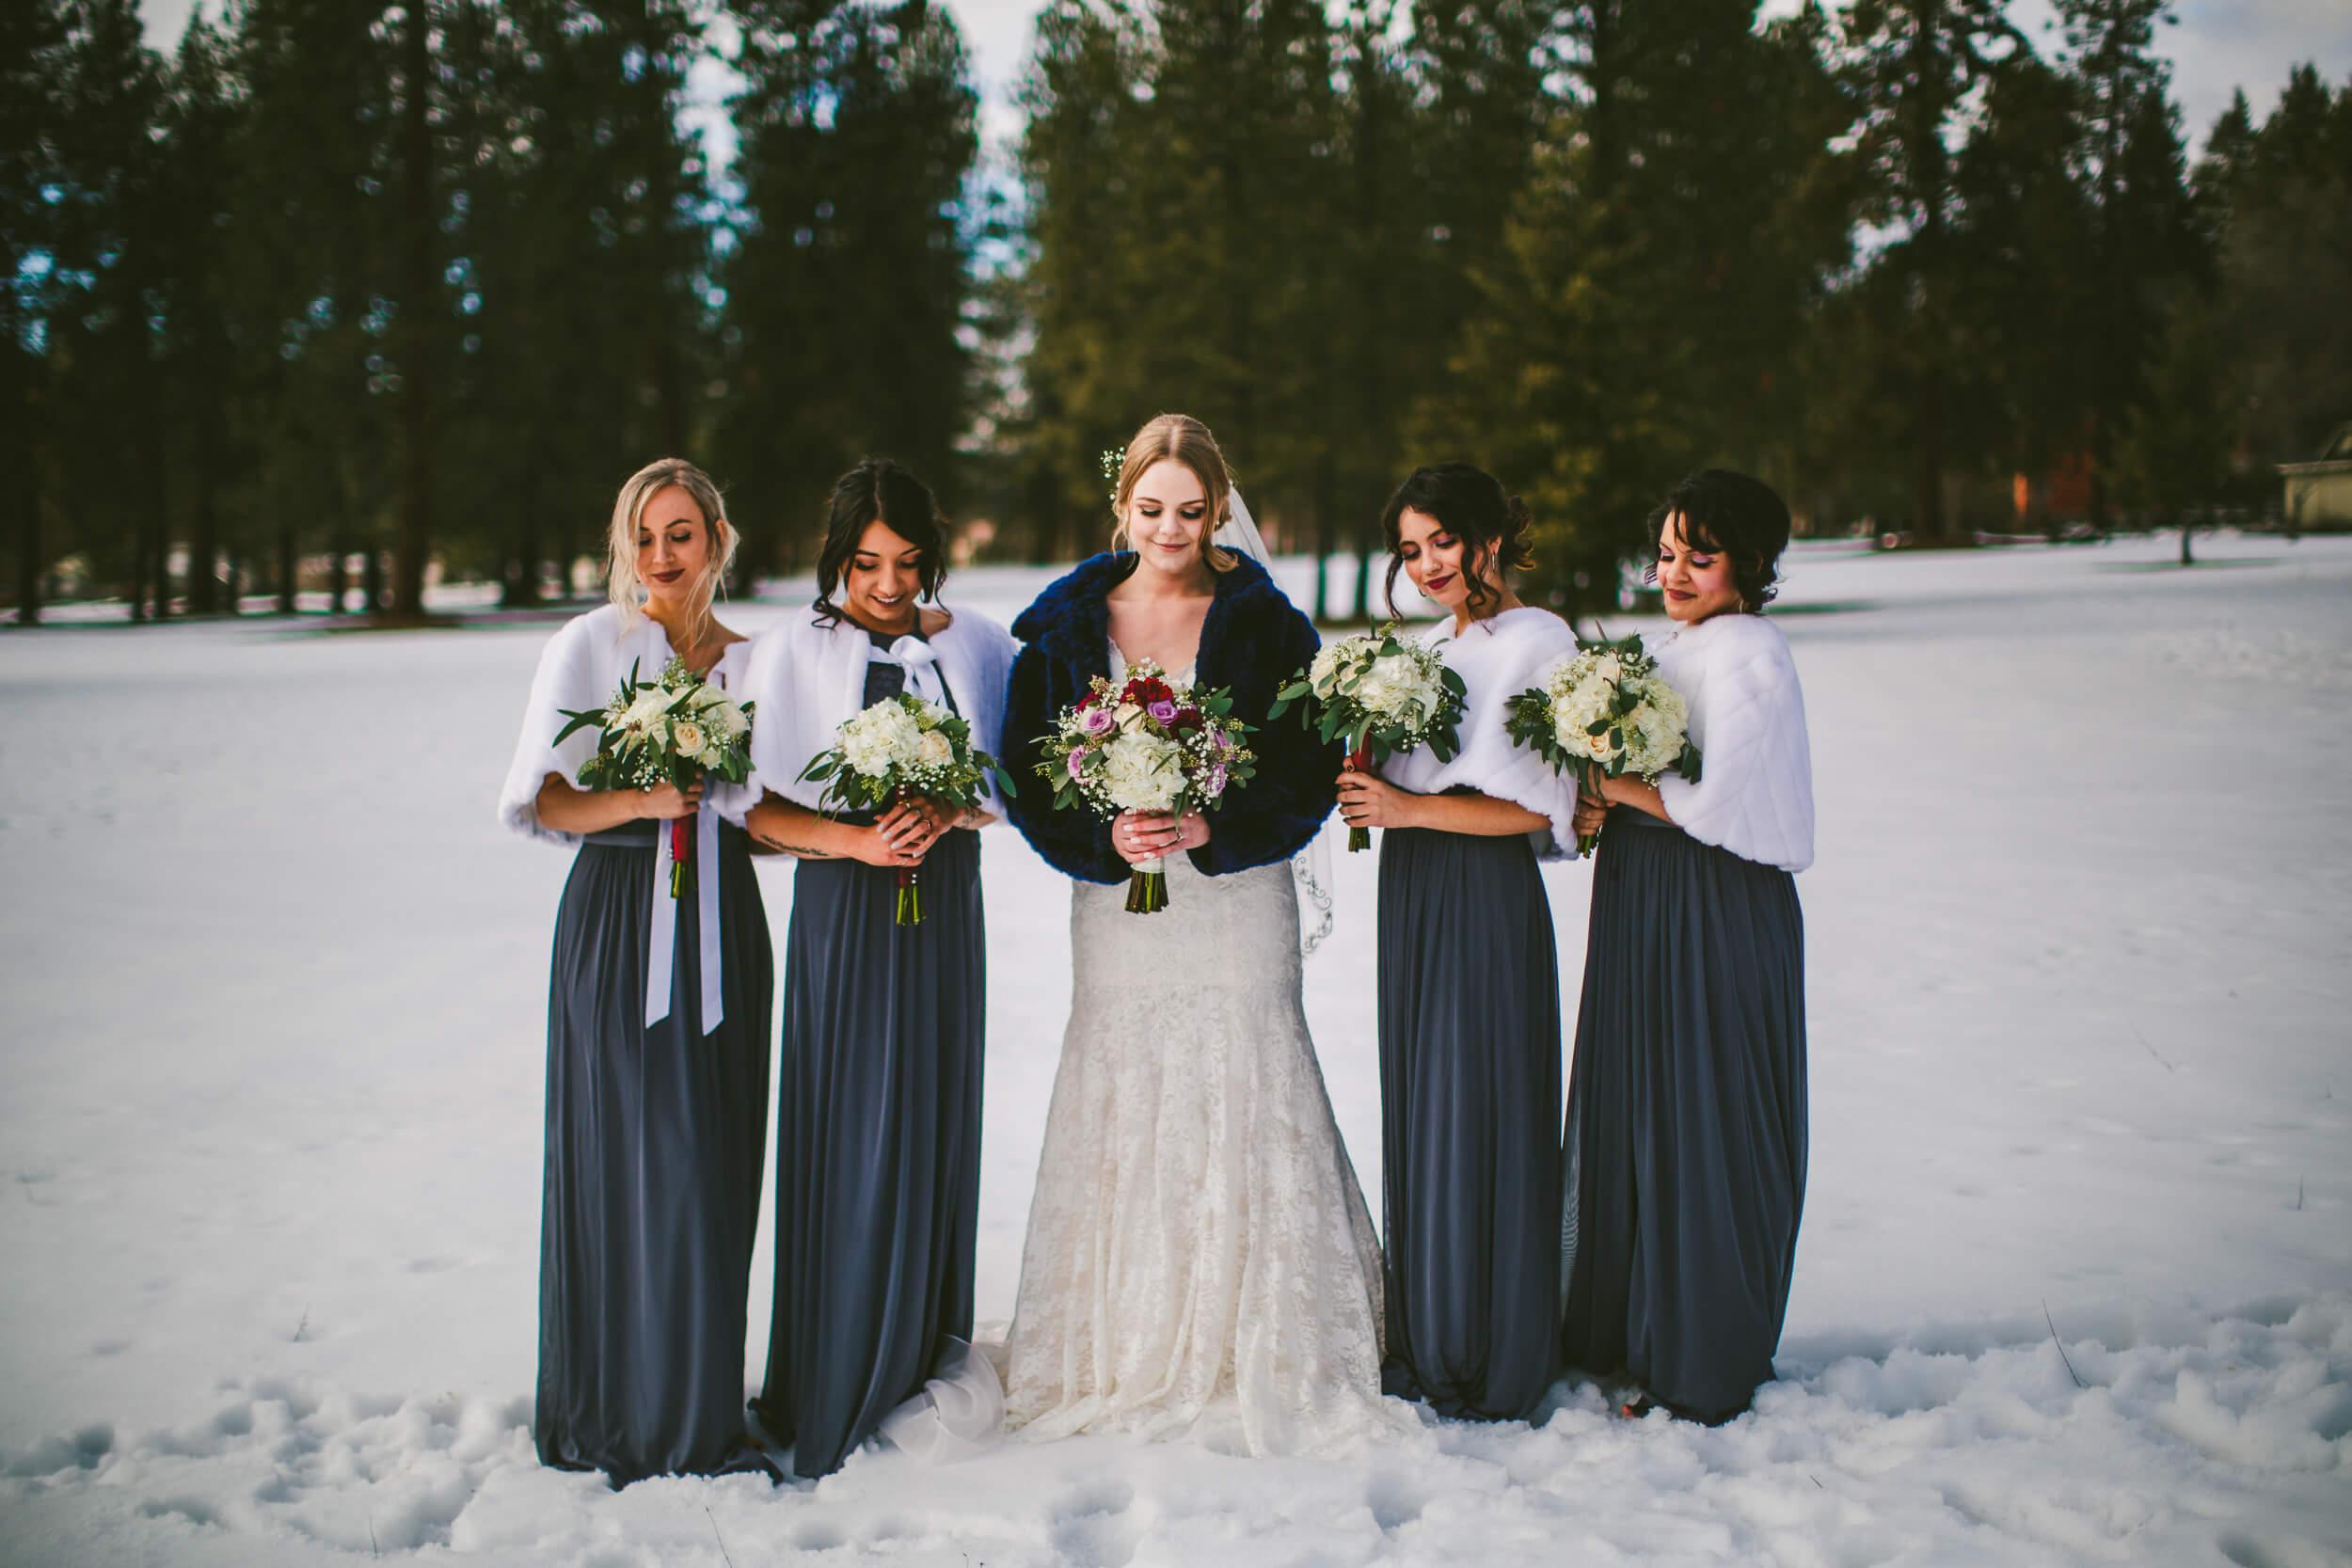 mukogawa winter wedding in spokane (102).jpg